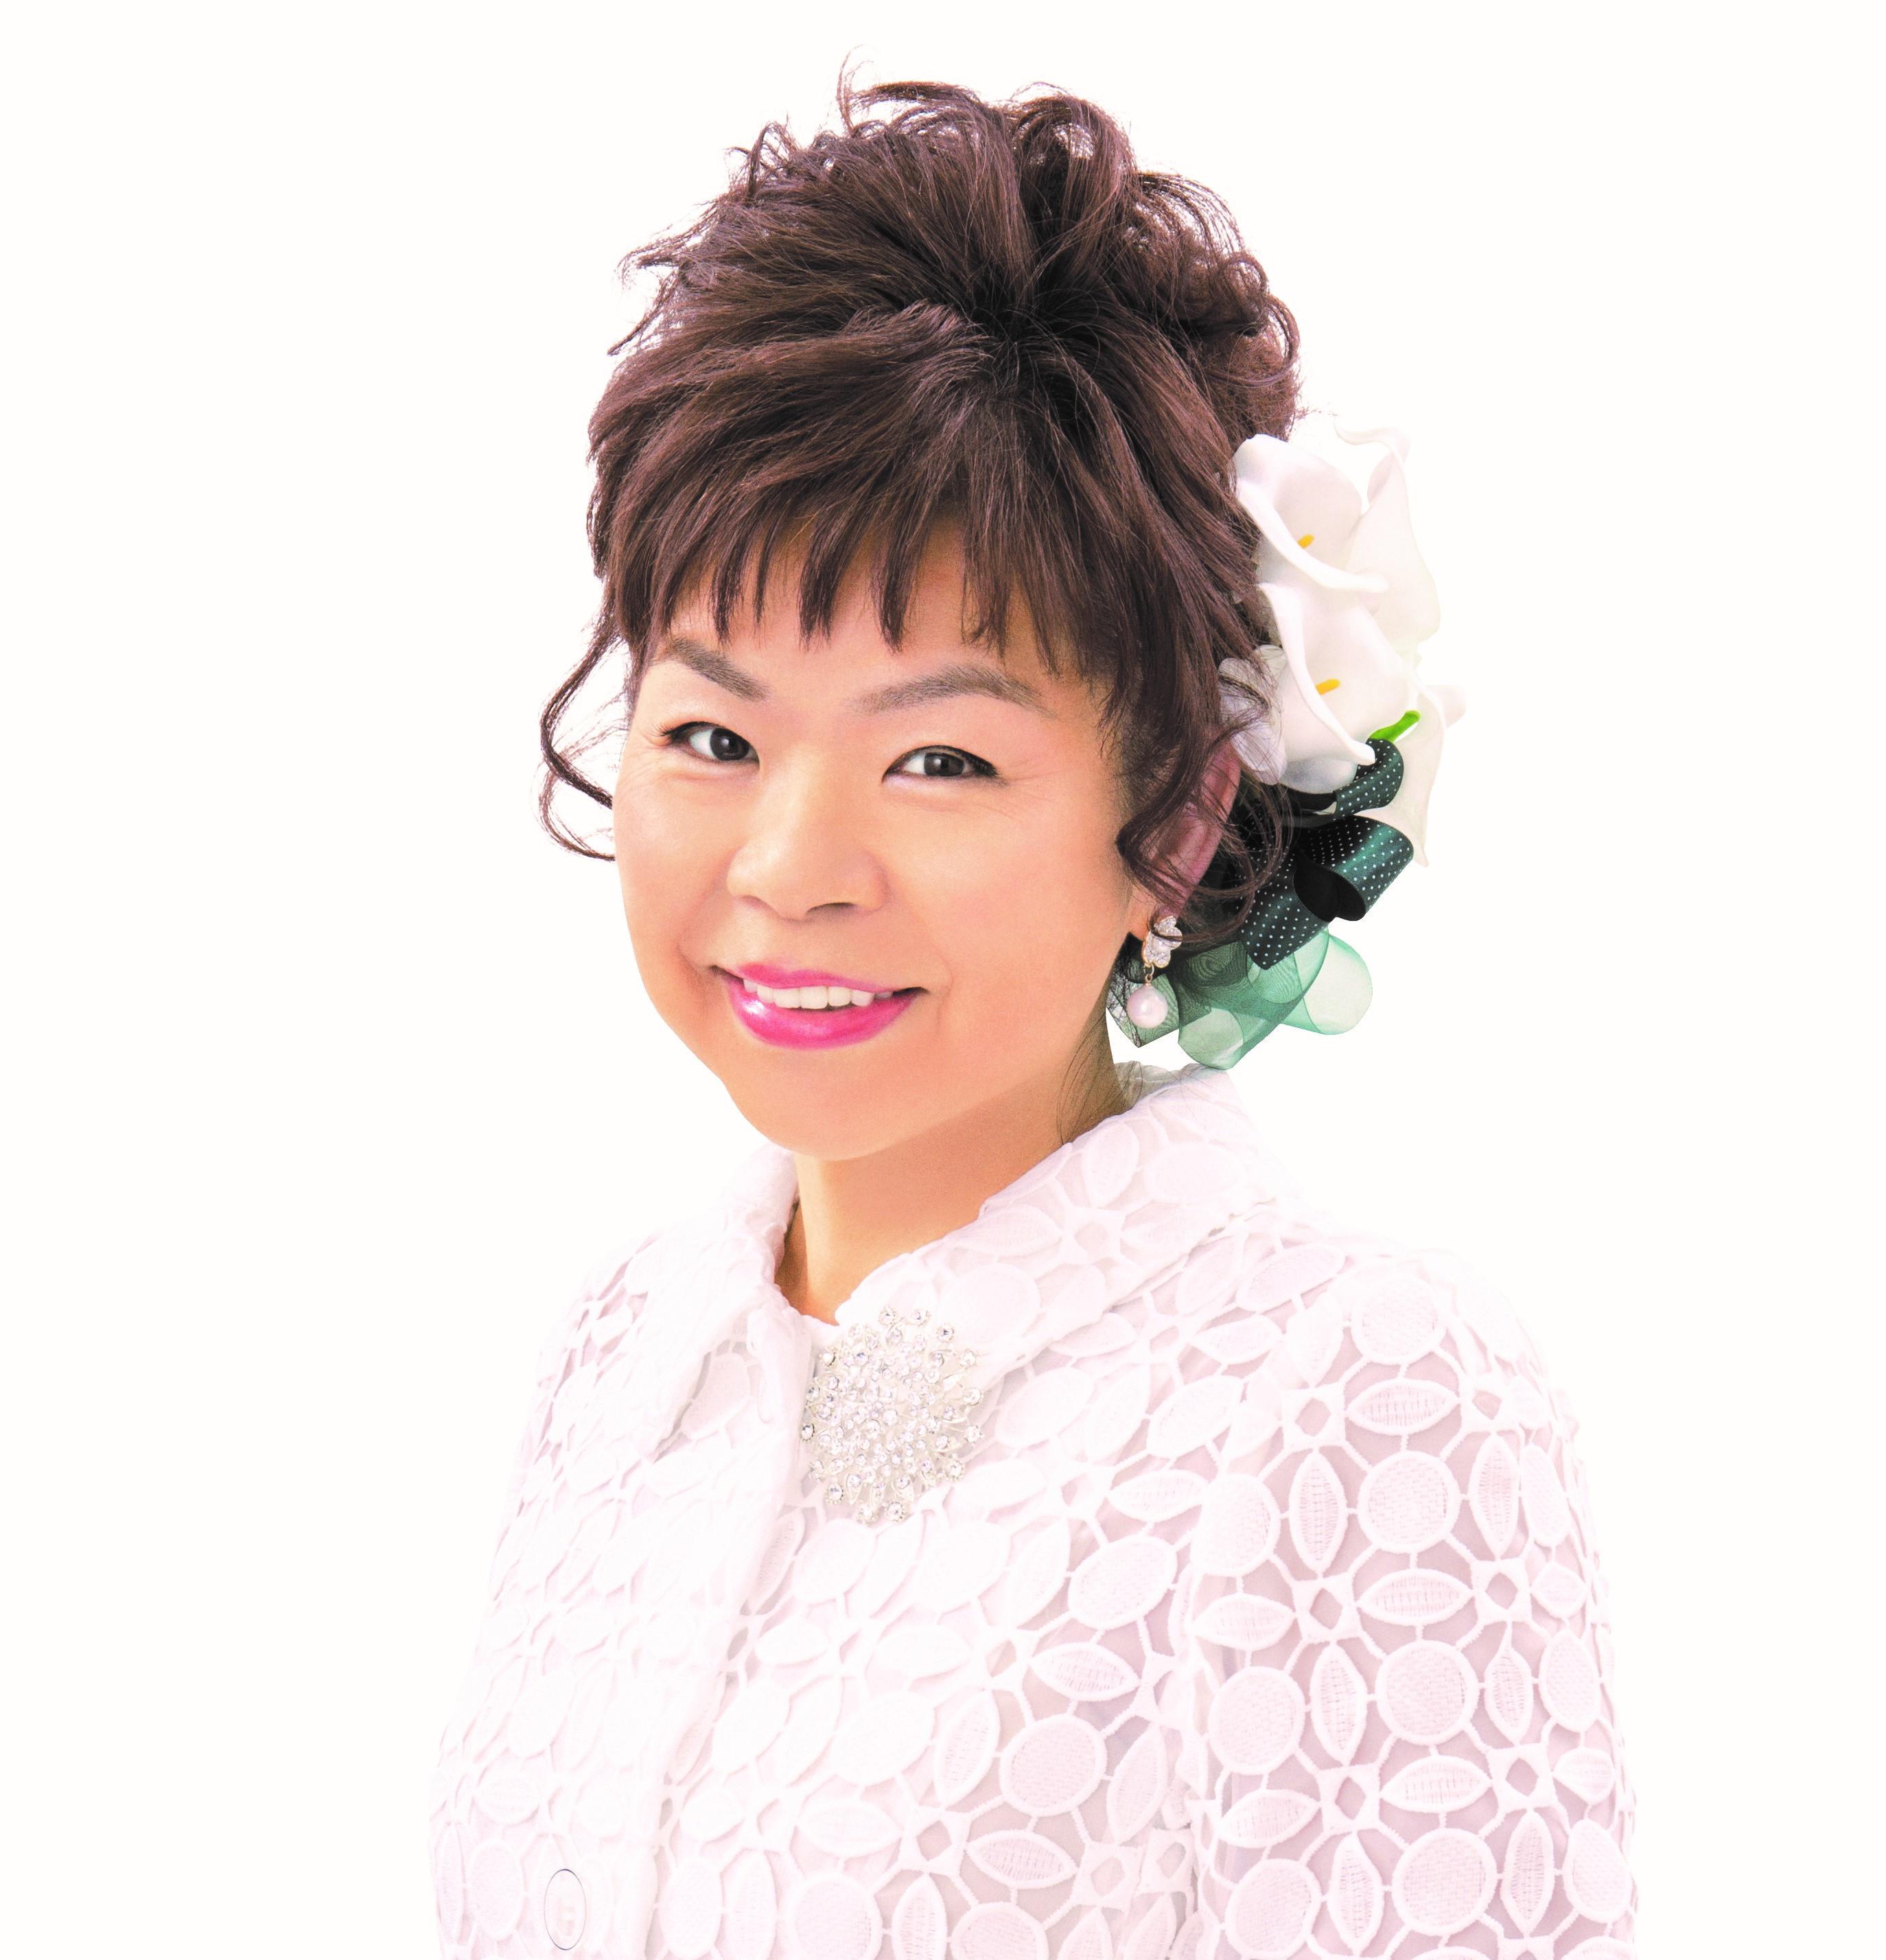 「2018九星別ユミリー風水」刊行記念 直居由美里先生サイン会